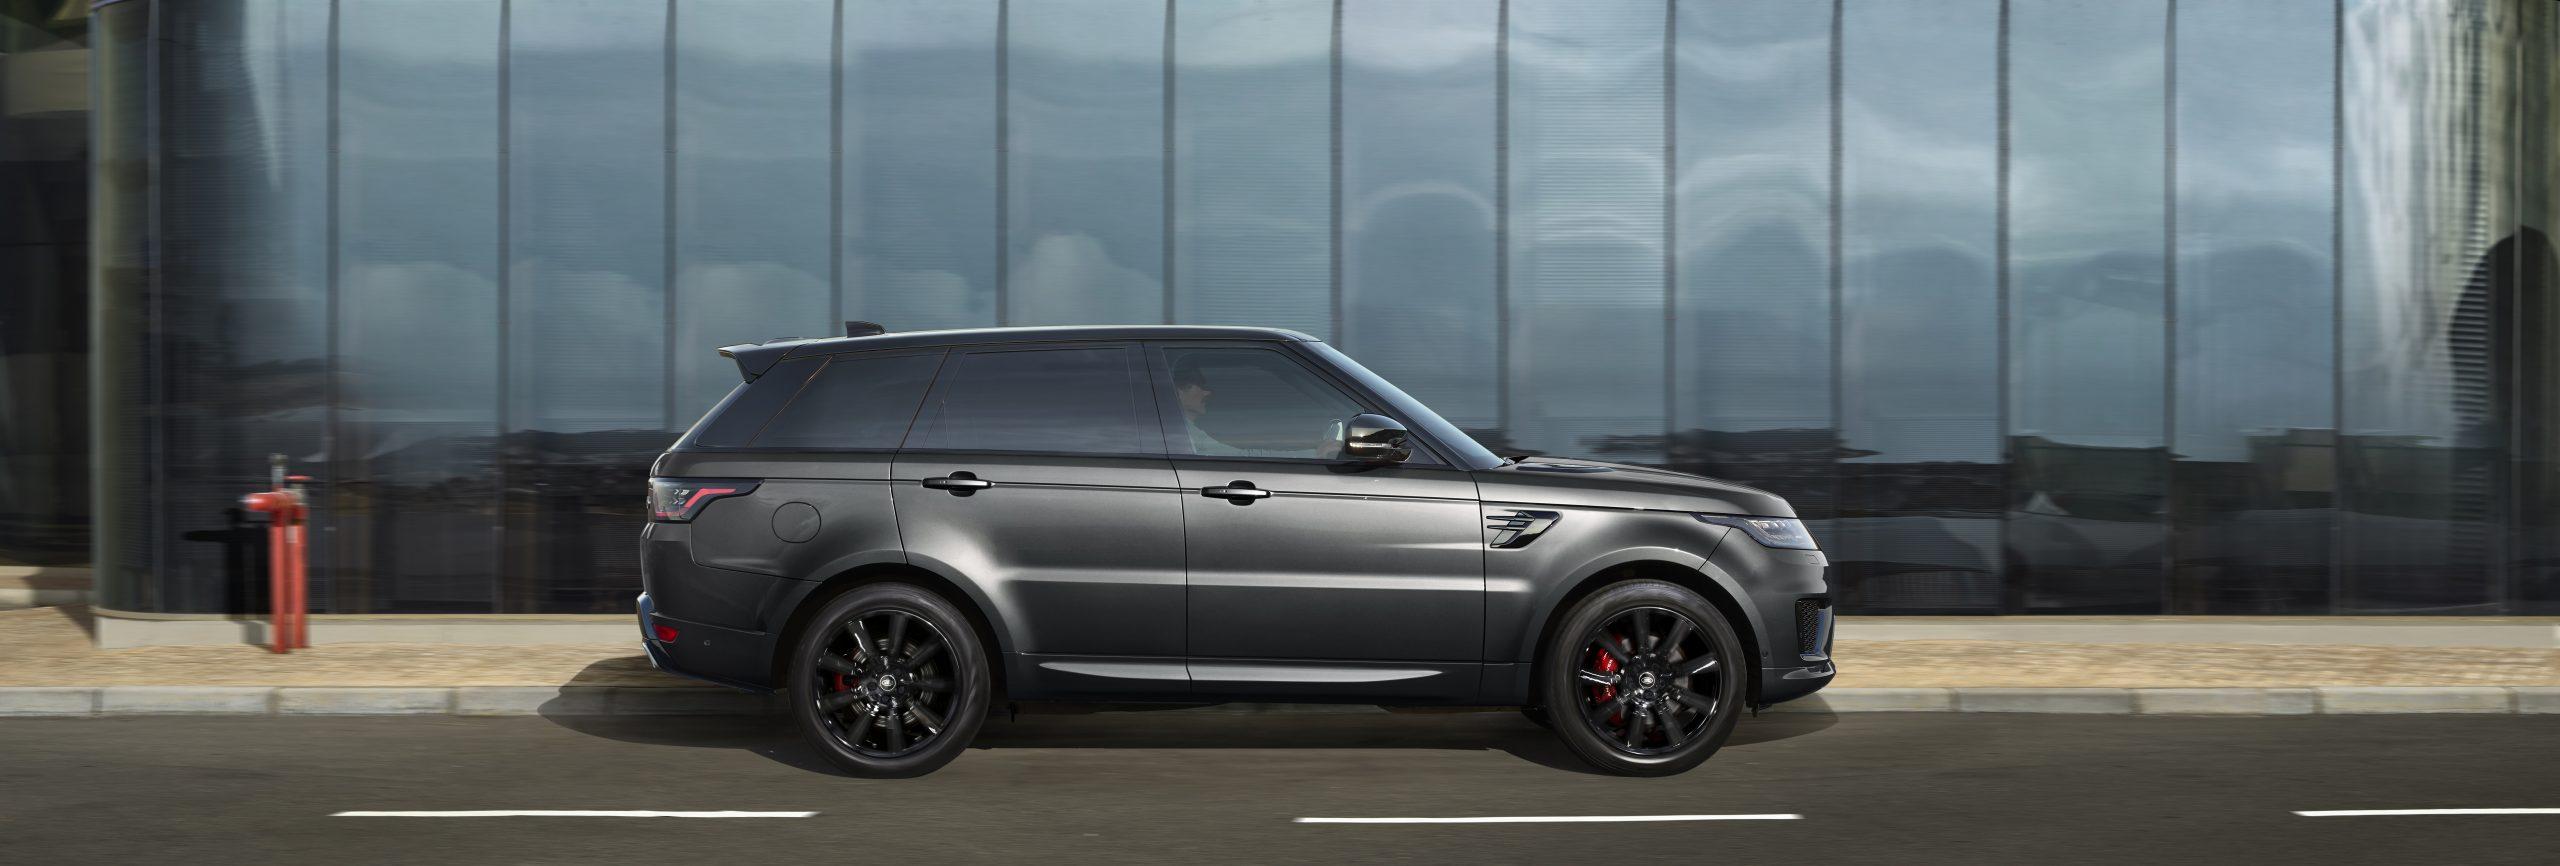 Silver Range Rover Velar R-Dynamic P400e 2020 2 4K HD Cars Wallpapers   HD Wallpapers   ID #43748